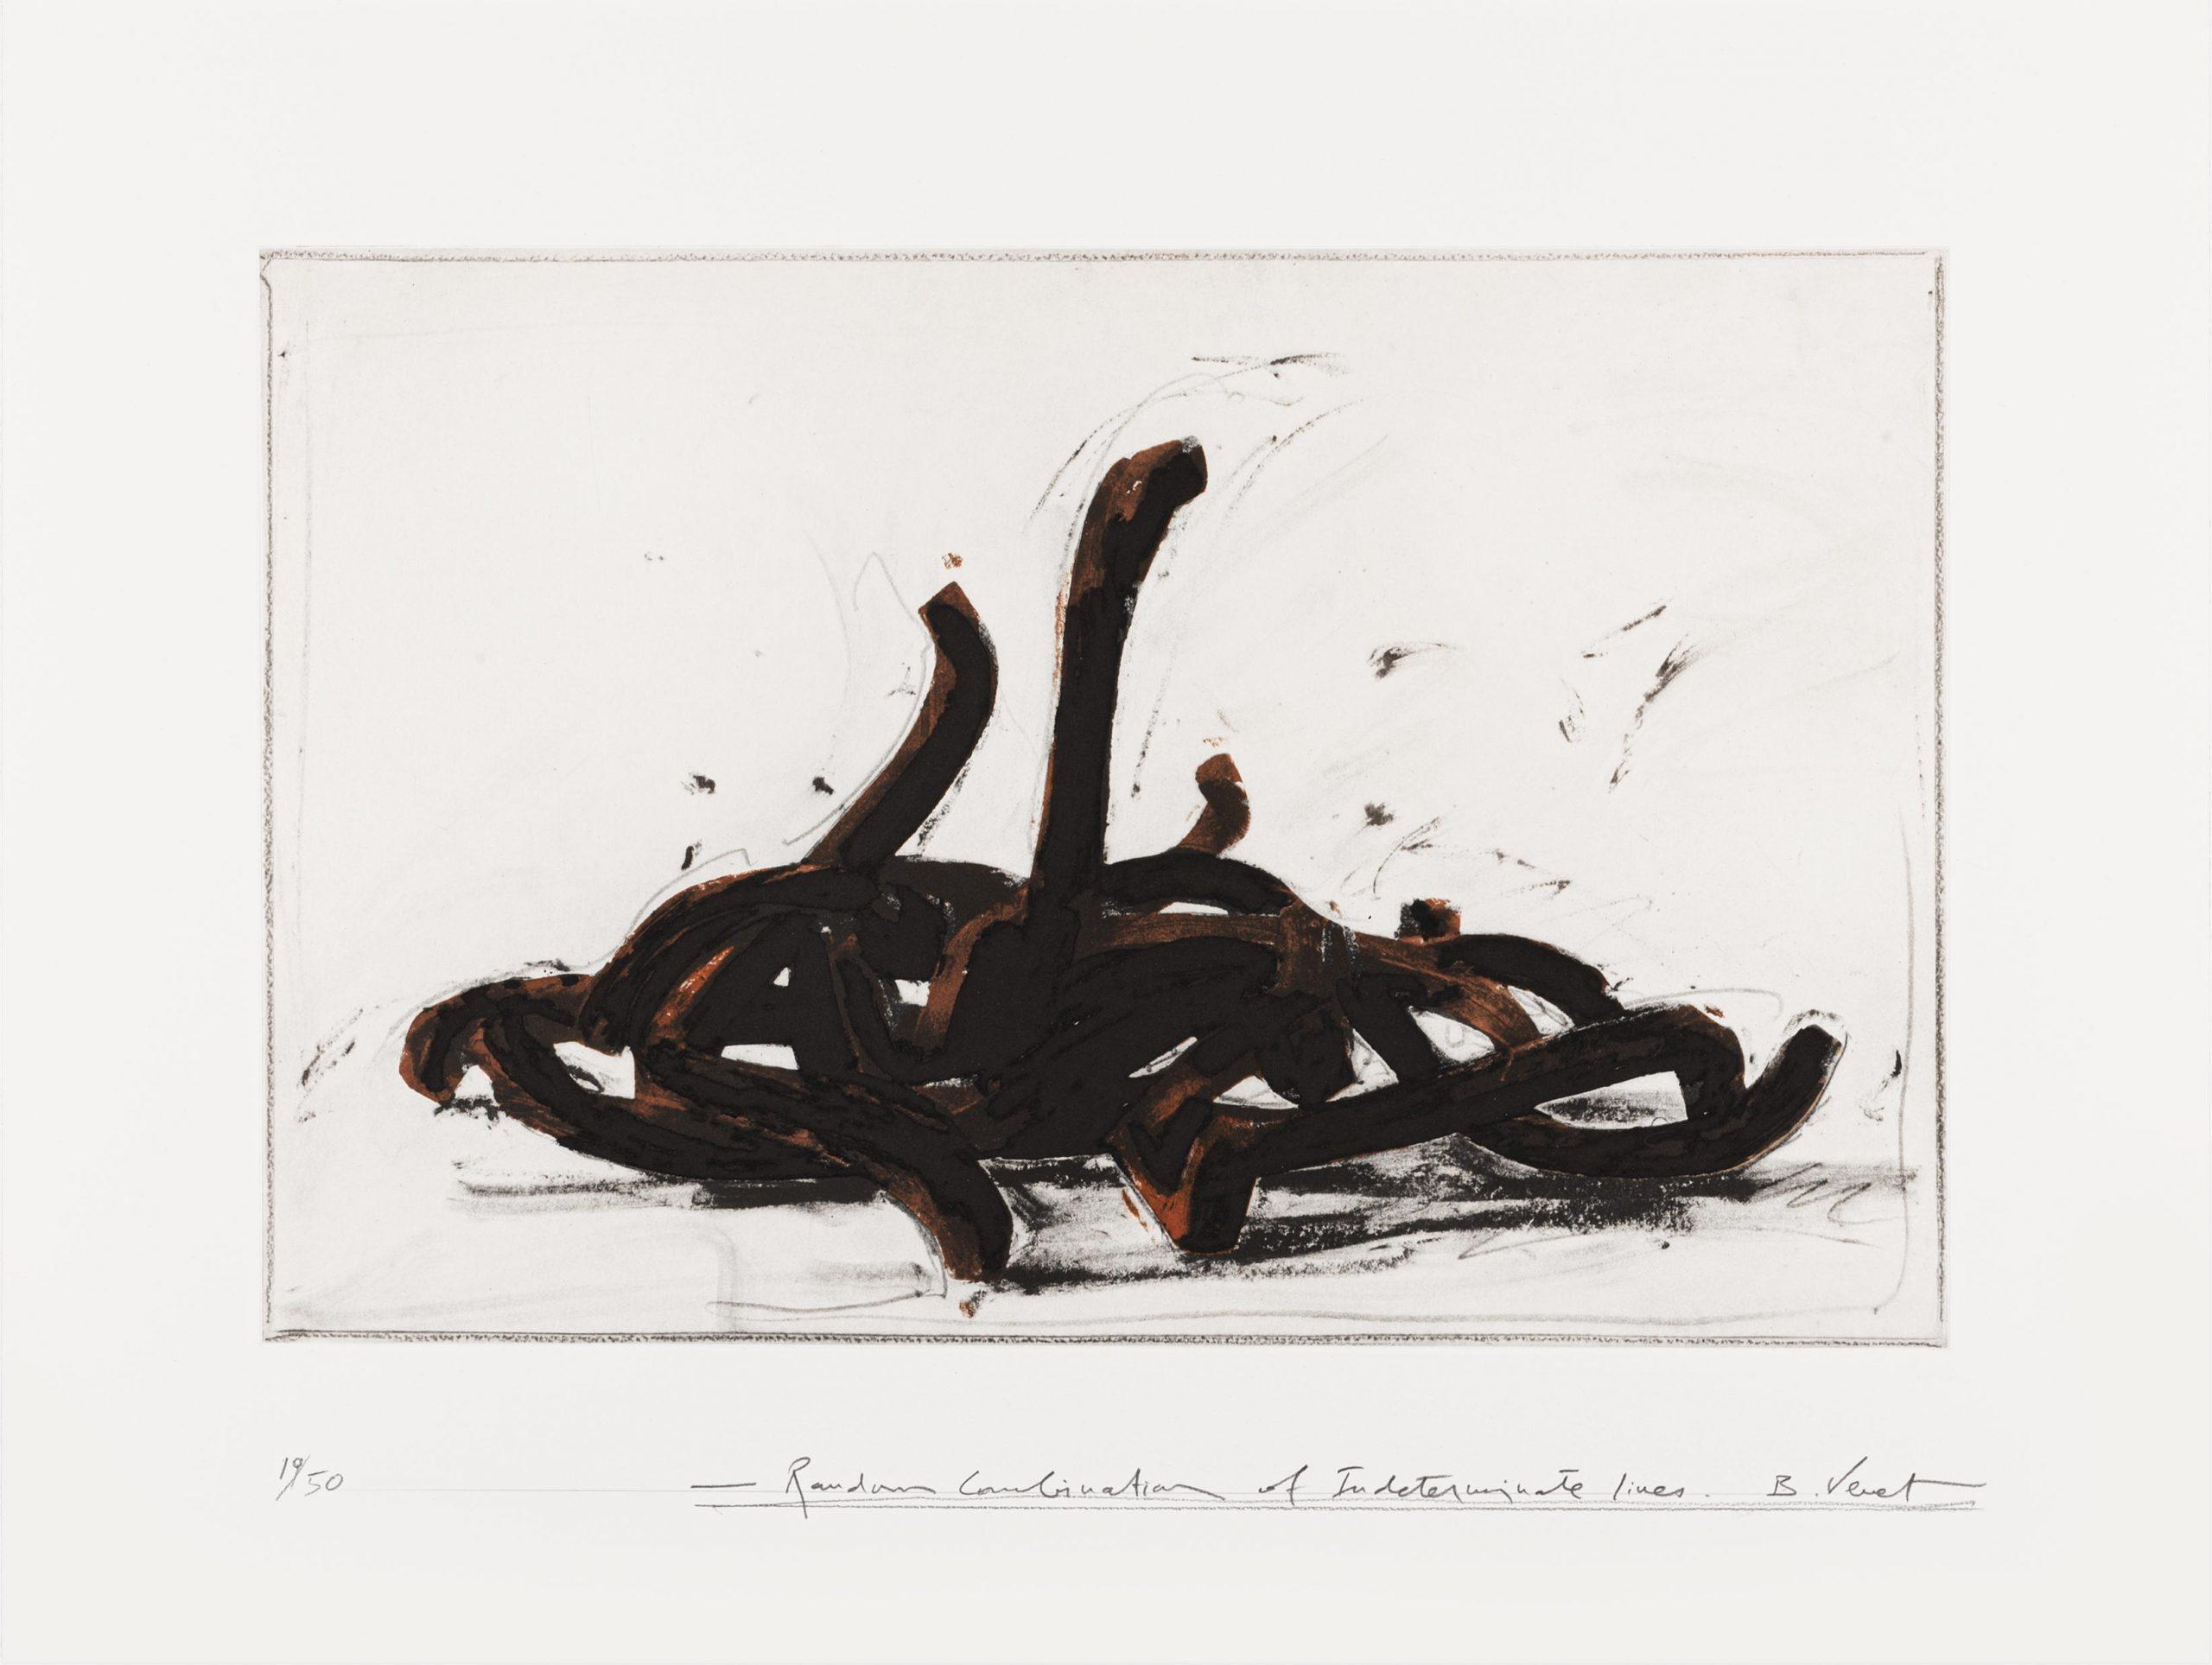 Random Combination Of Indeterminate Lines 03 by Bernar Venet